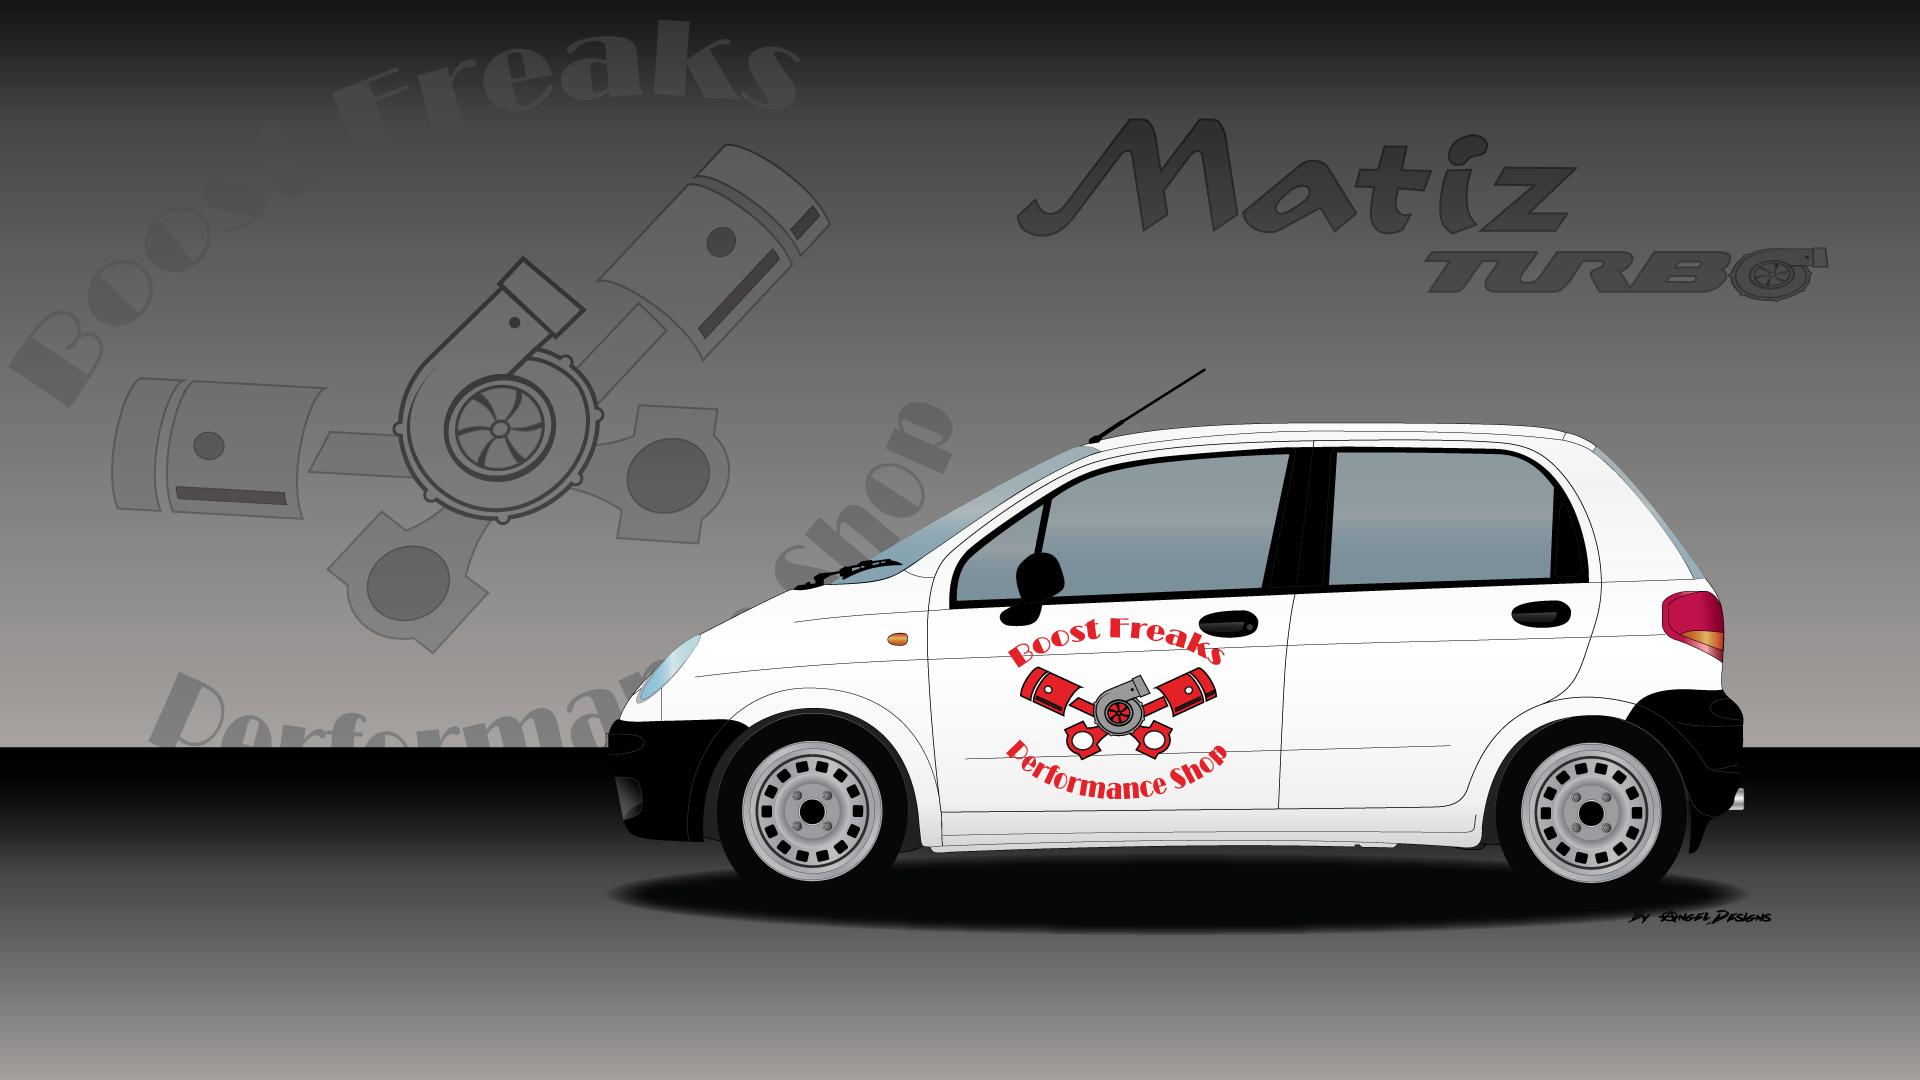 Daewoo Matiz Turbo - Boost Freaks | My Car Designs | Pinterest